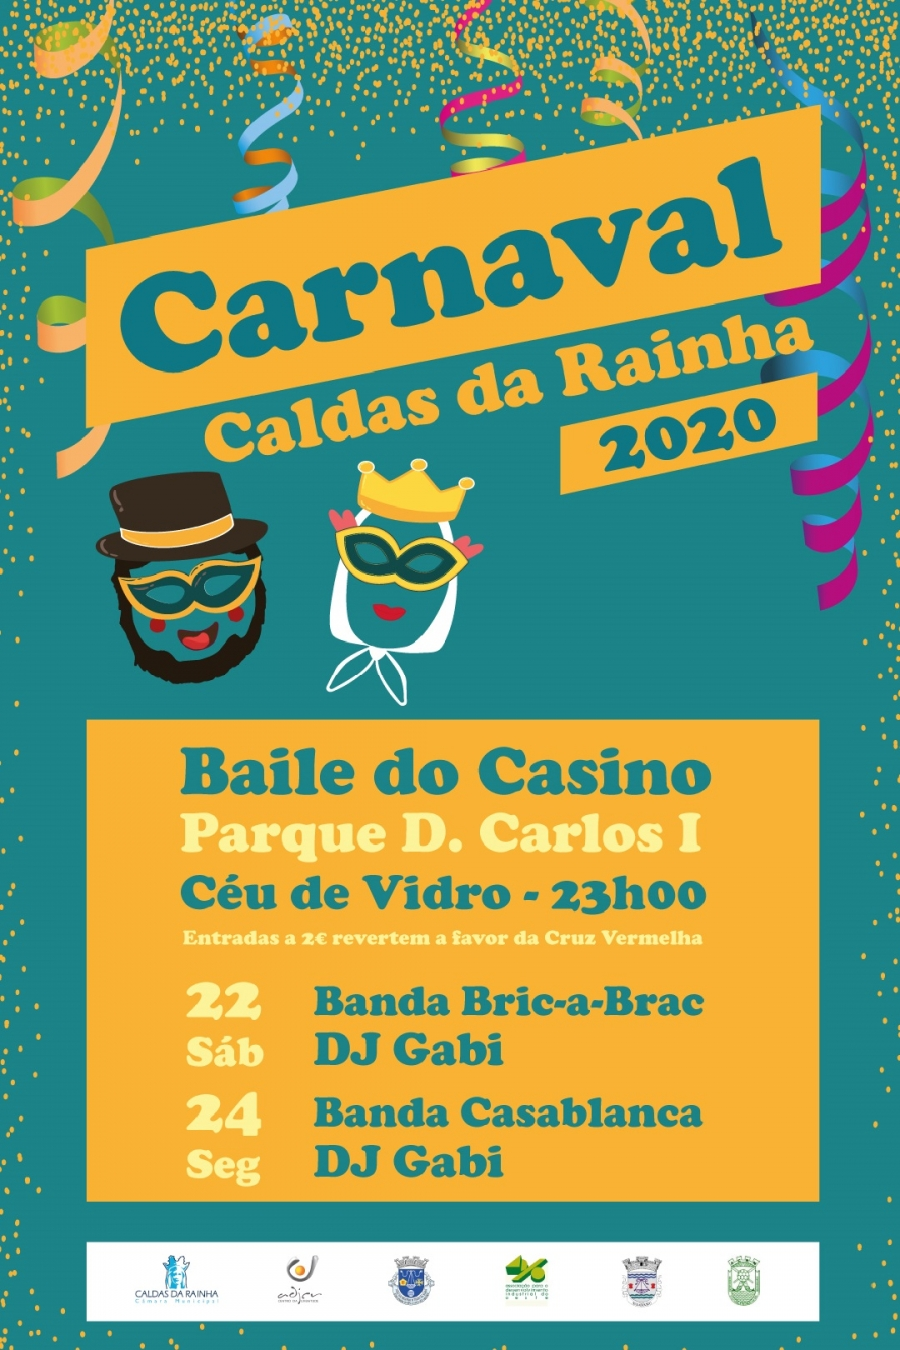 Baile do Casino- Carnaval